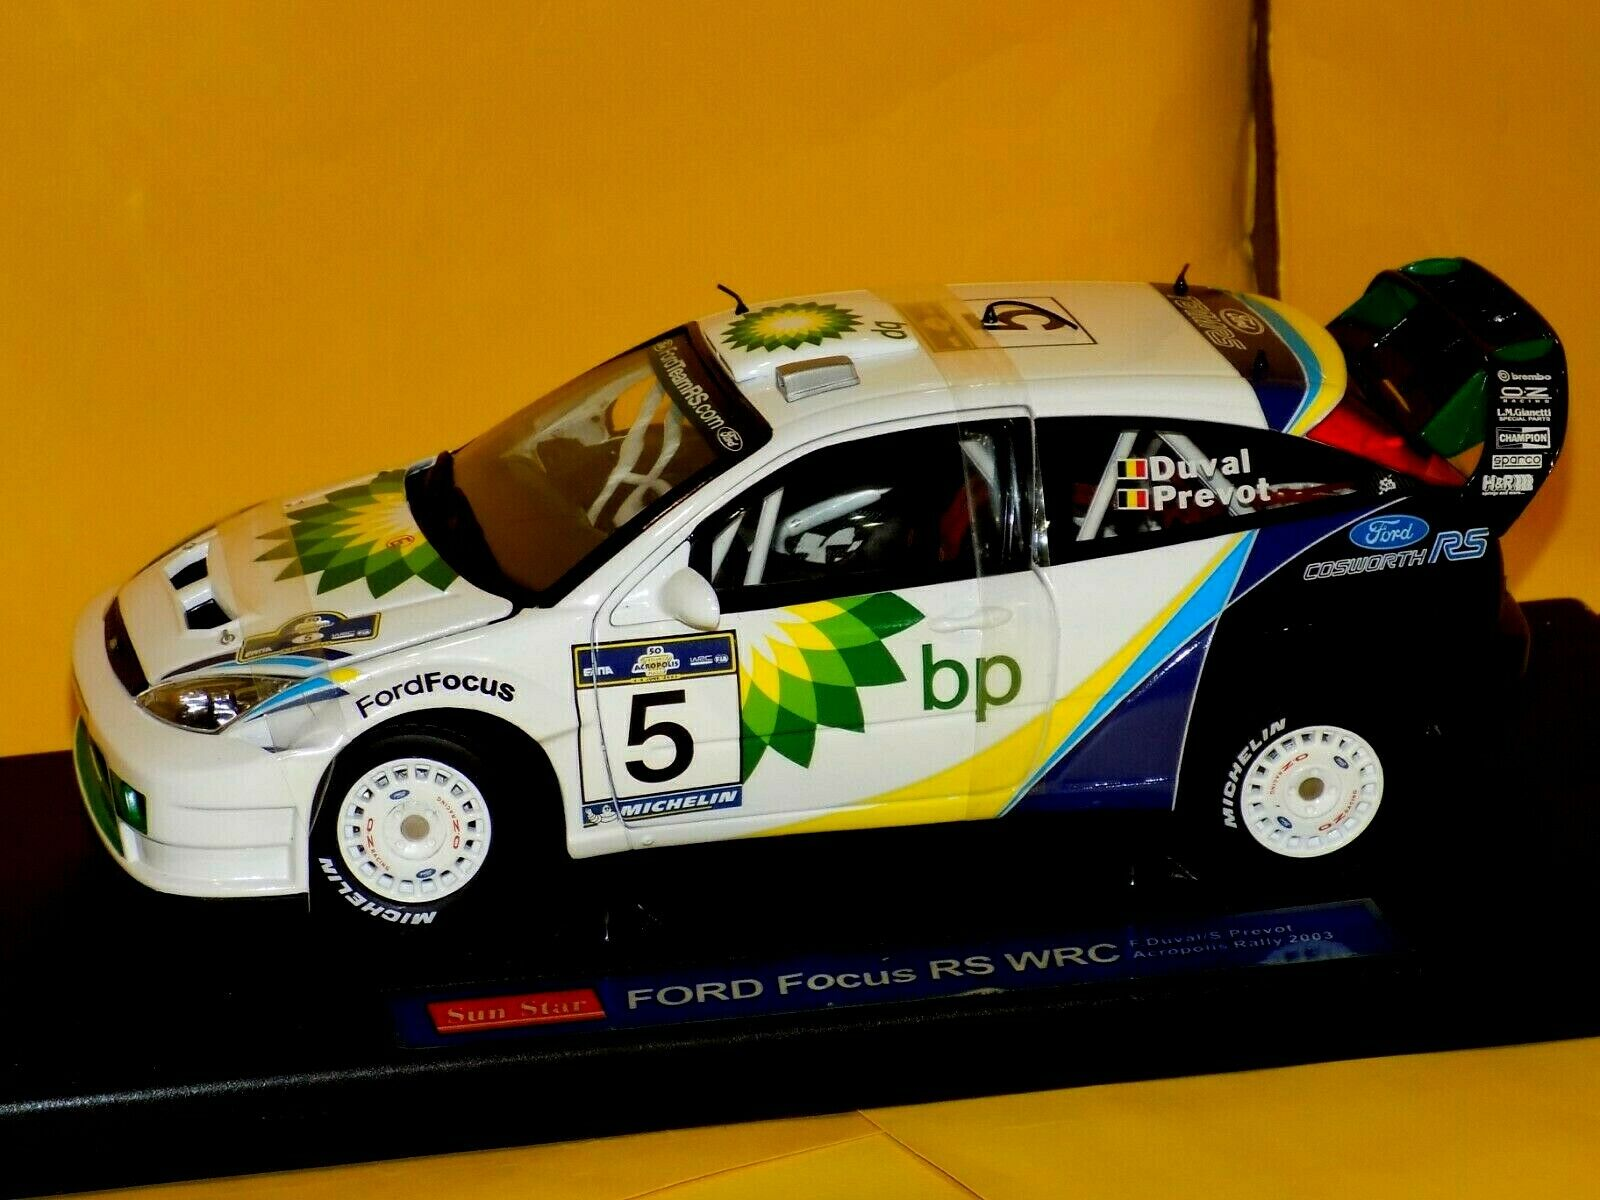 Ford Focus RS WRC Acropolis 2003 Duval Prevot  Sunstar 3902 1 18